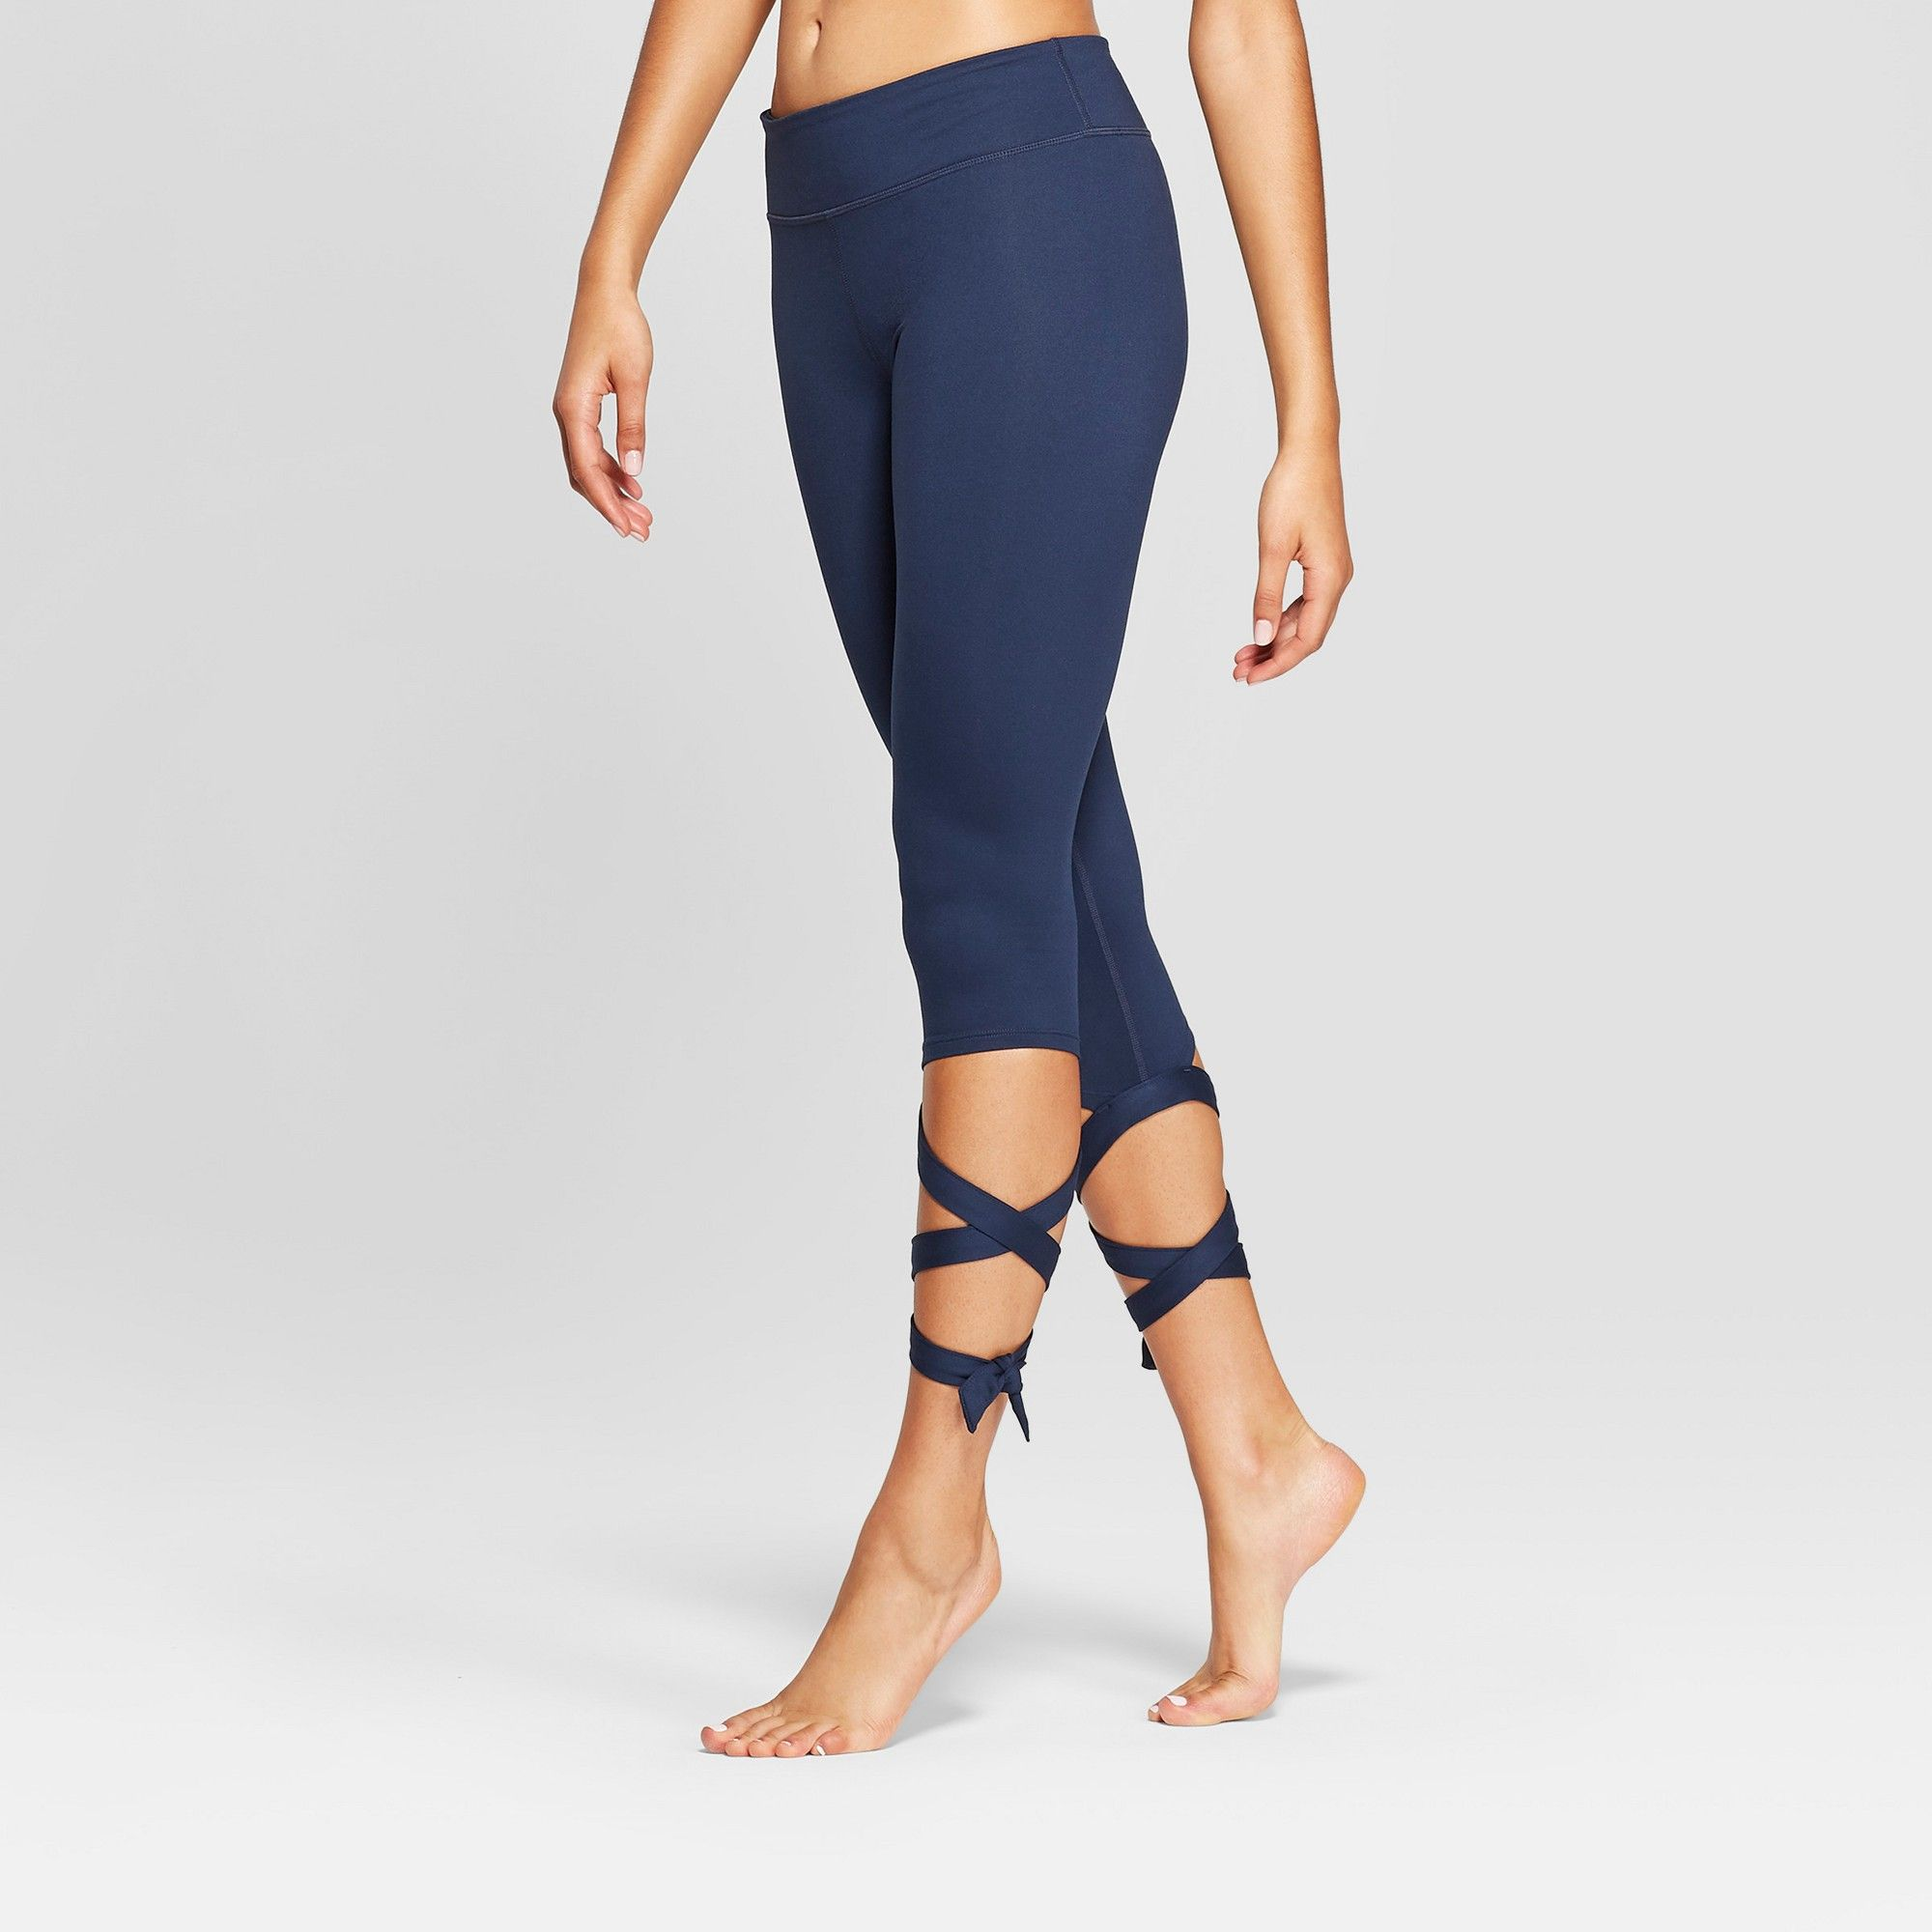 9320635bf1e6 Women s Comfort Side Tie Mid-Rise Capri Leggings - JoyLab Navy (Blue) Xxl